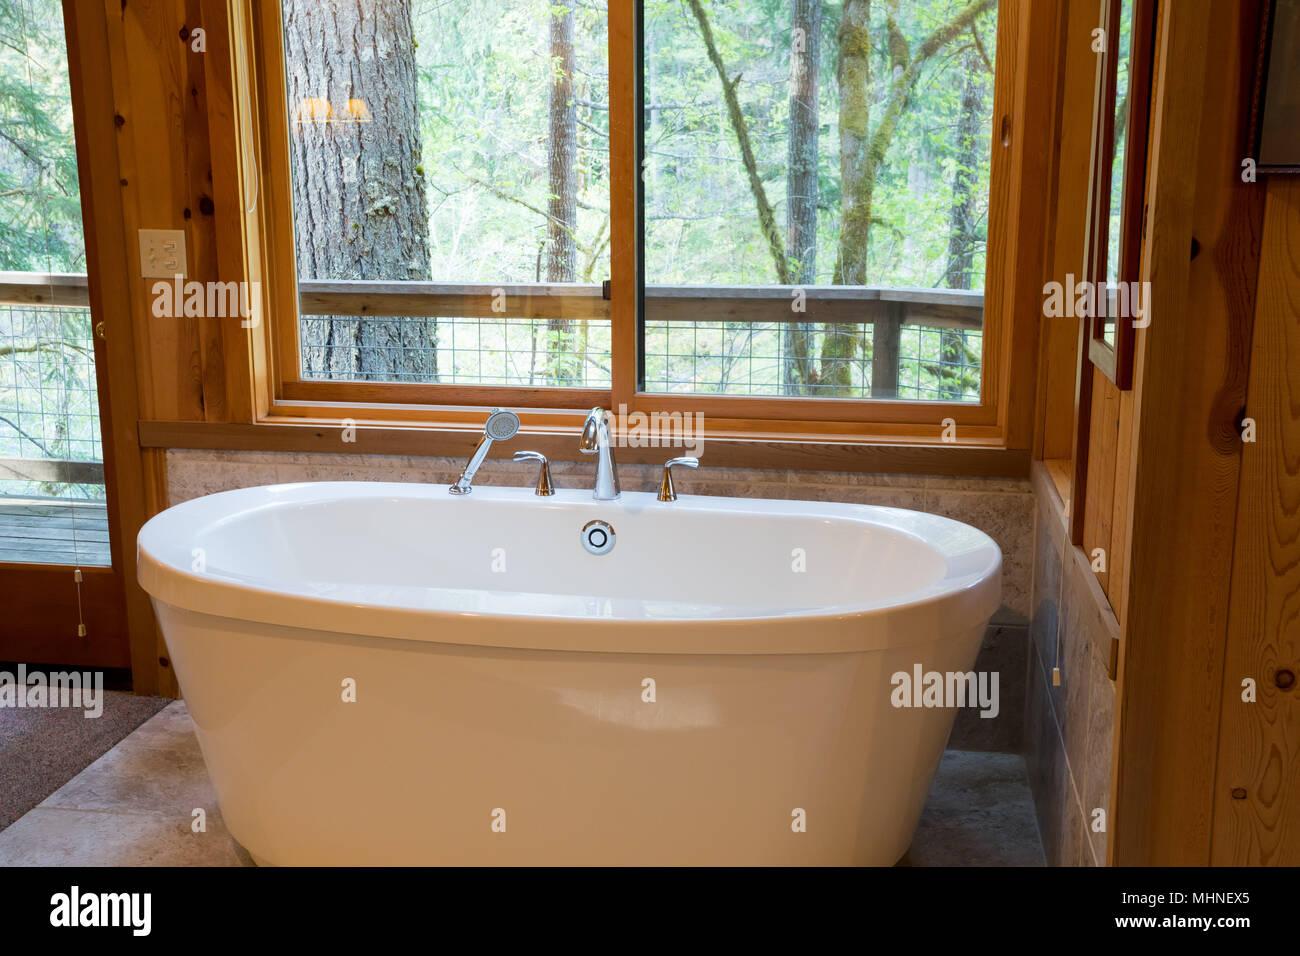 Soaking Bath Tub in Cabin Stock Photo: 183025533 - Alamy